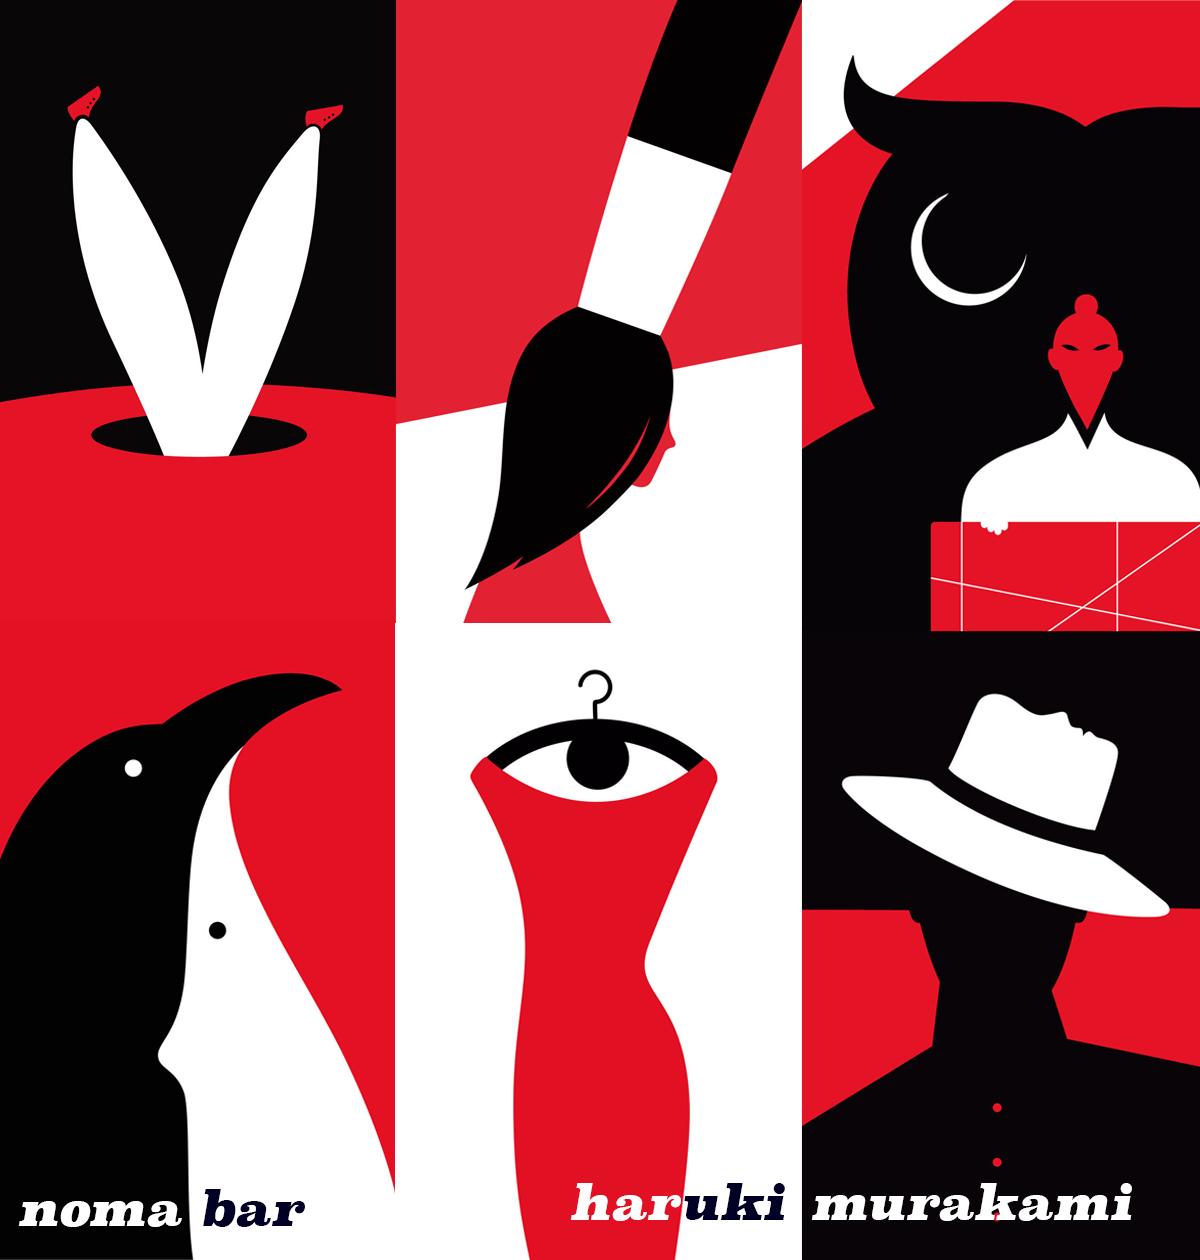 Noma Bar featured Image